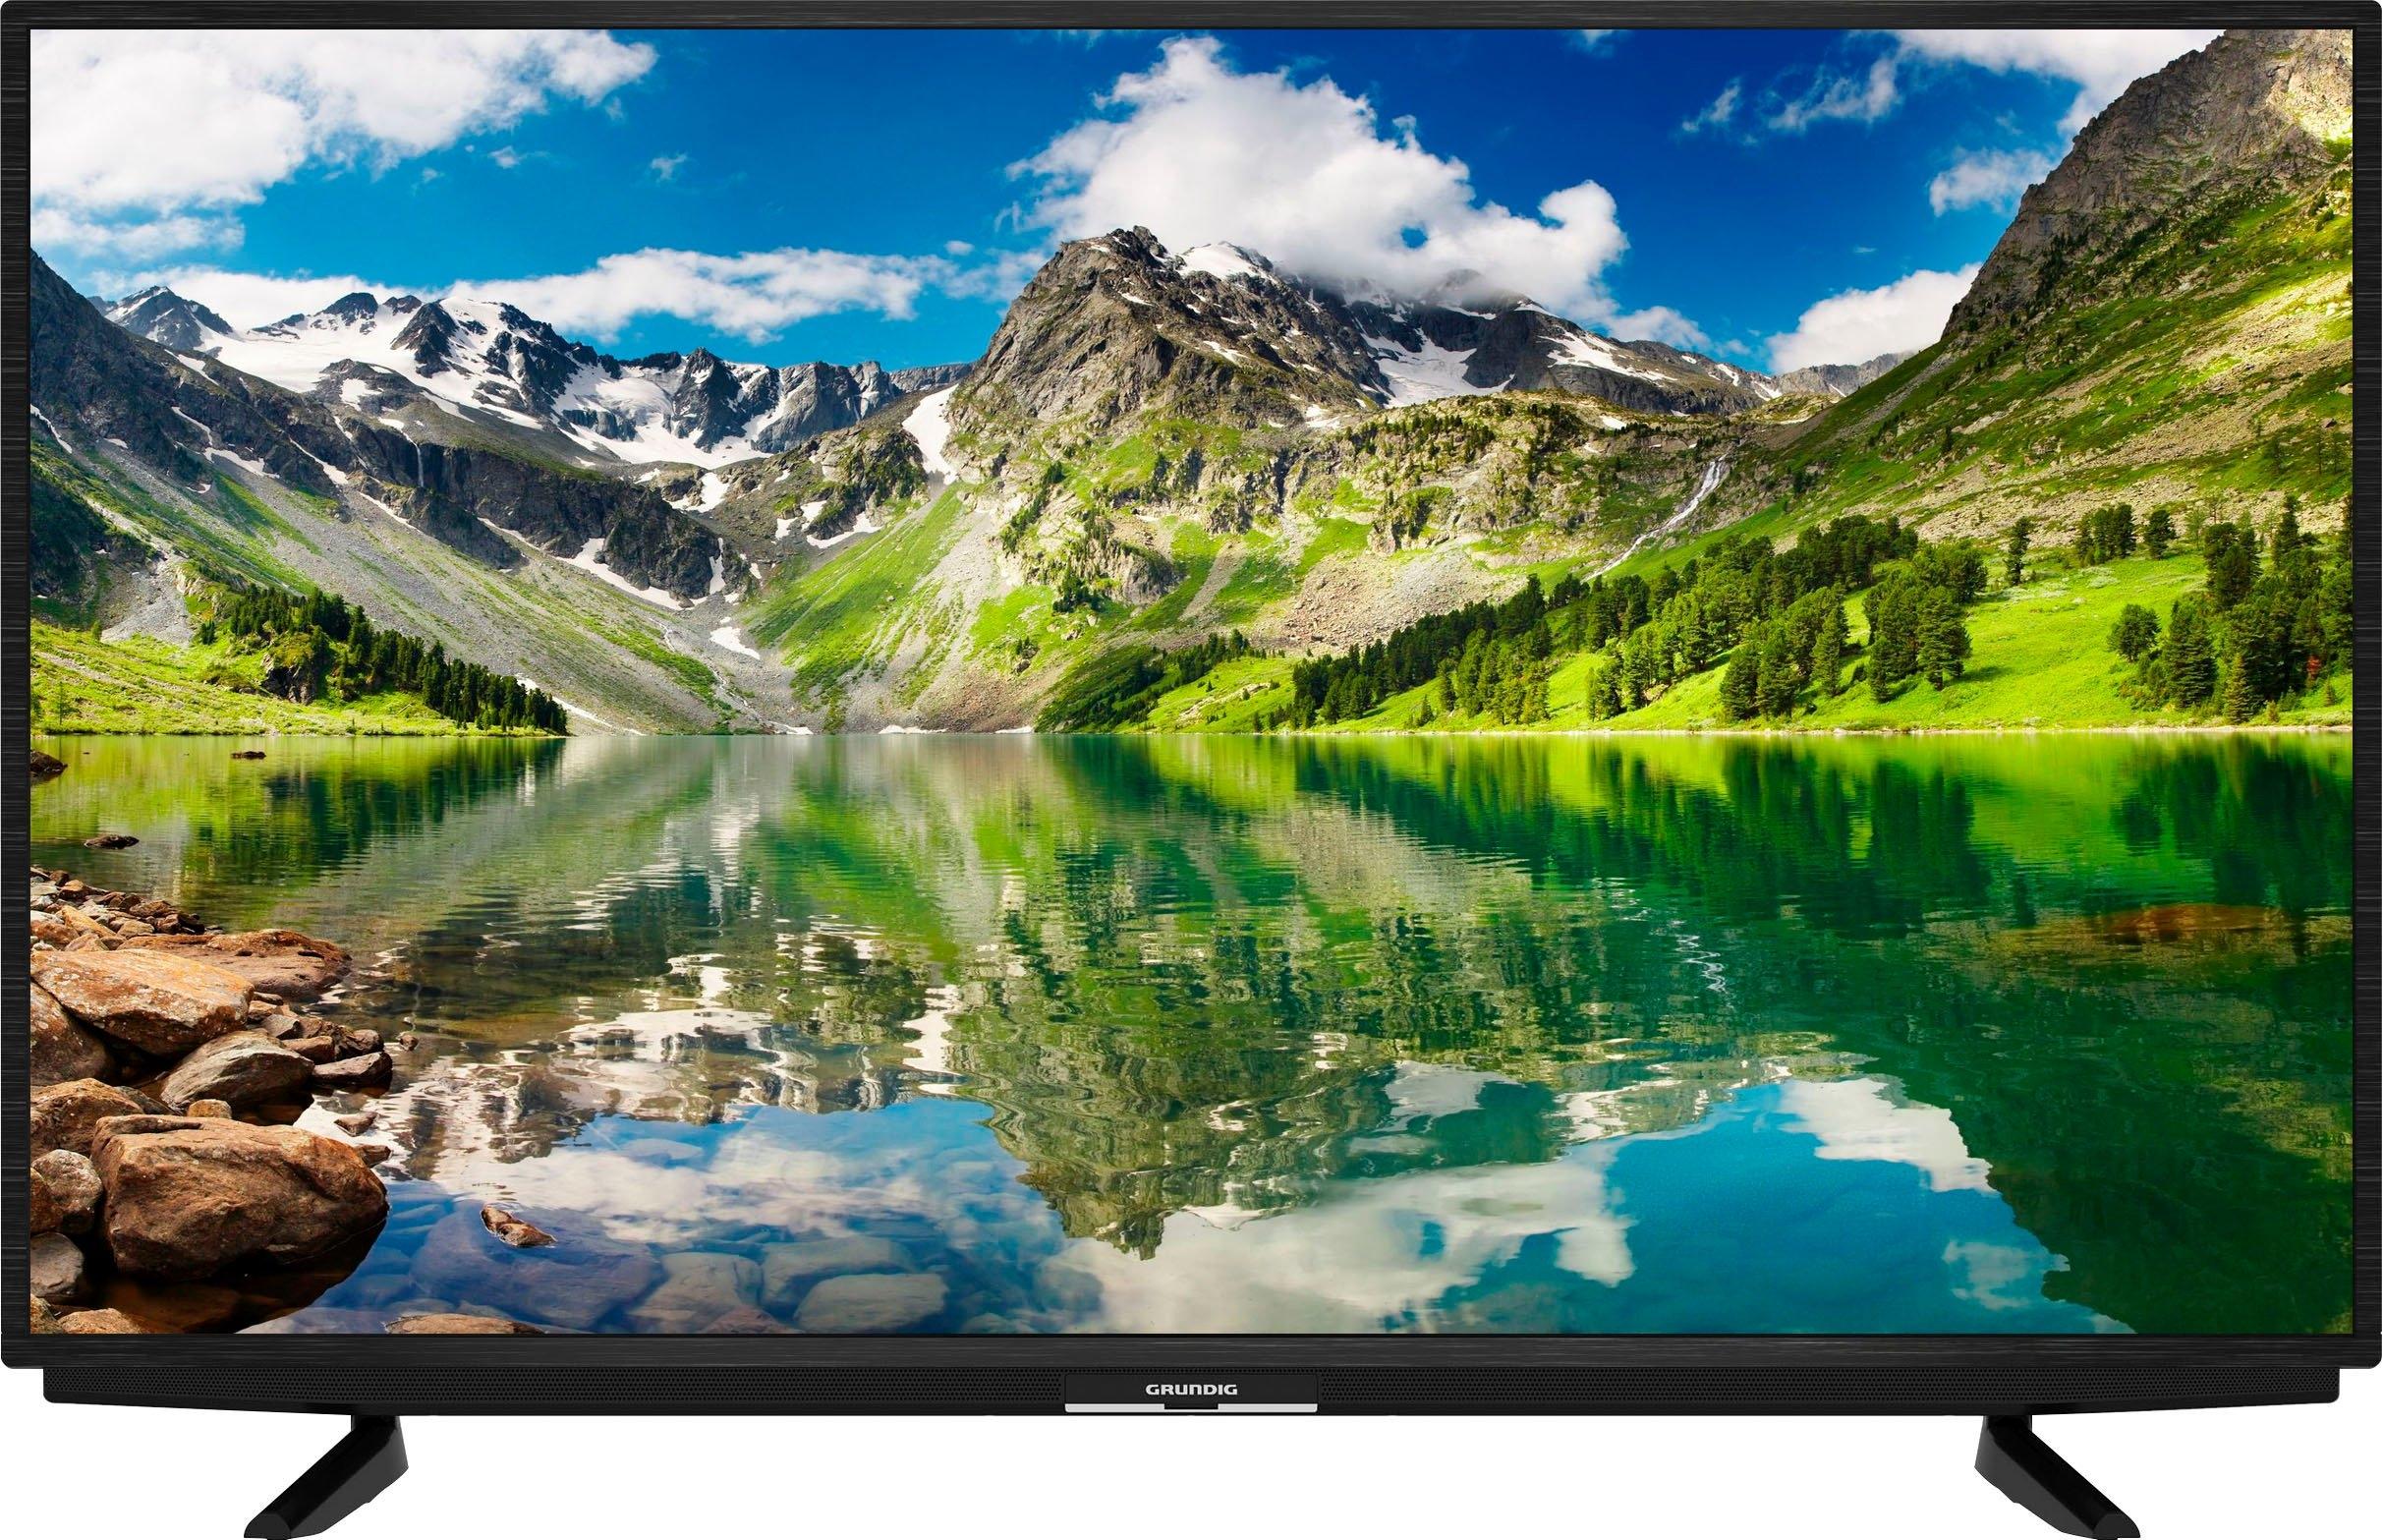 Grundig LED-TV 65 VOE 71 - Fire TV Edition TRJ000, 164 cm / 65